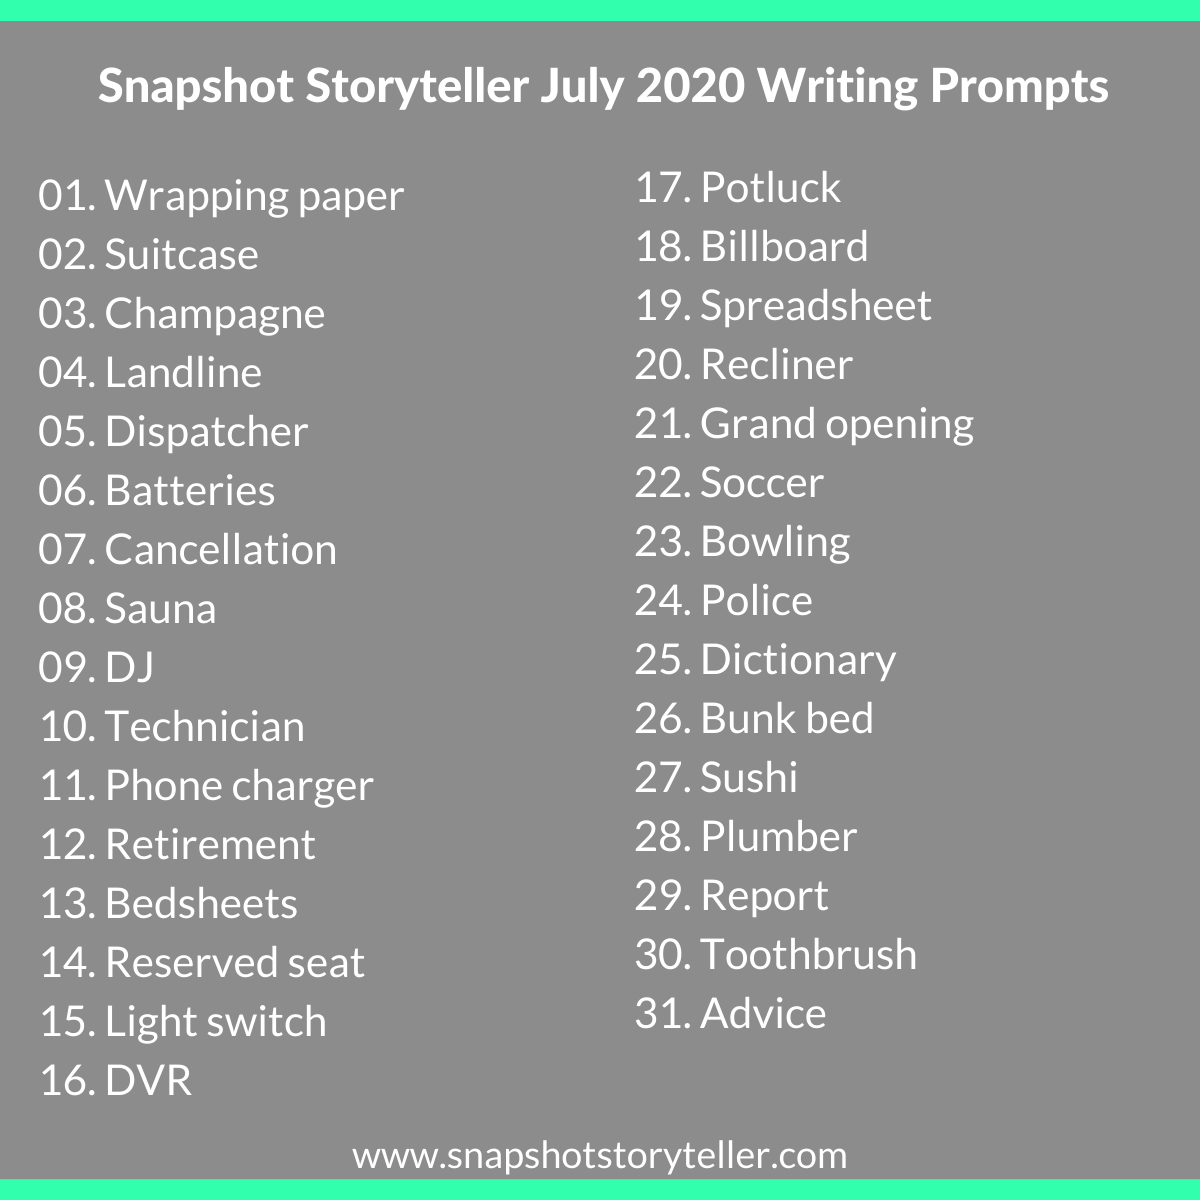 Snapshot Storyteller | July 2020 Writing Prompts | www.snapshotstoryteller.com | #amwriting #SnapshotStoryteller #creativestoryteller #creative #storyteller #creativewriter #IWrite #WriteOn #writersofinstagram #writingprompt #writingprompts